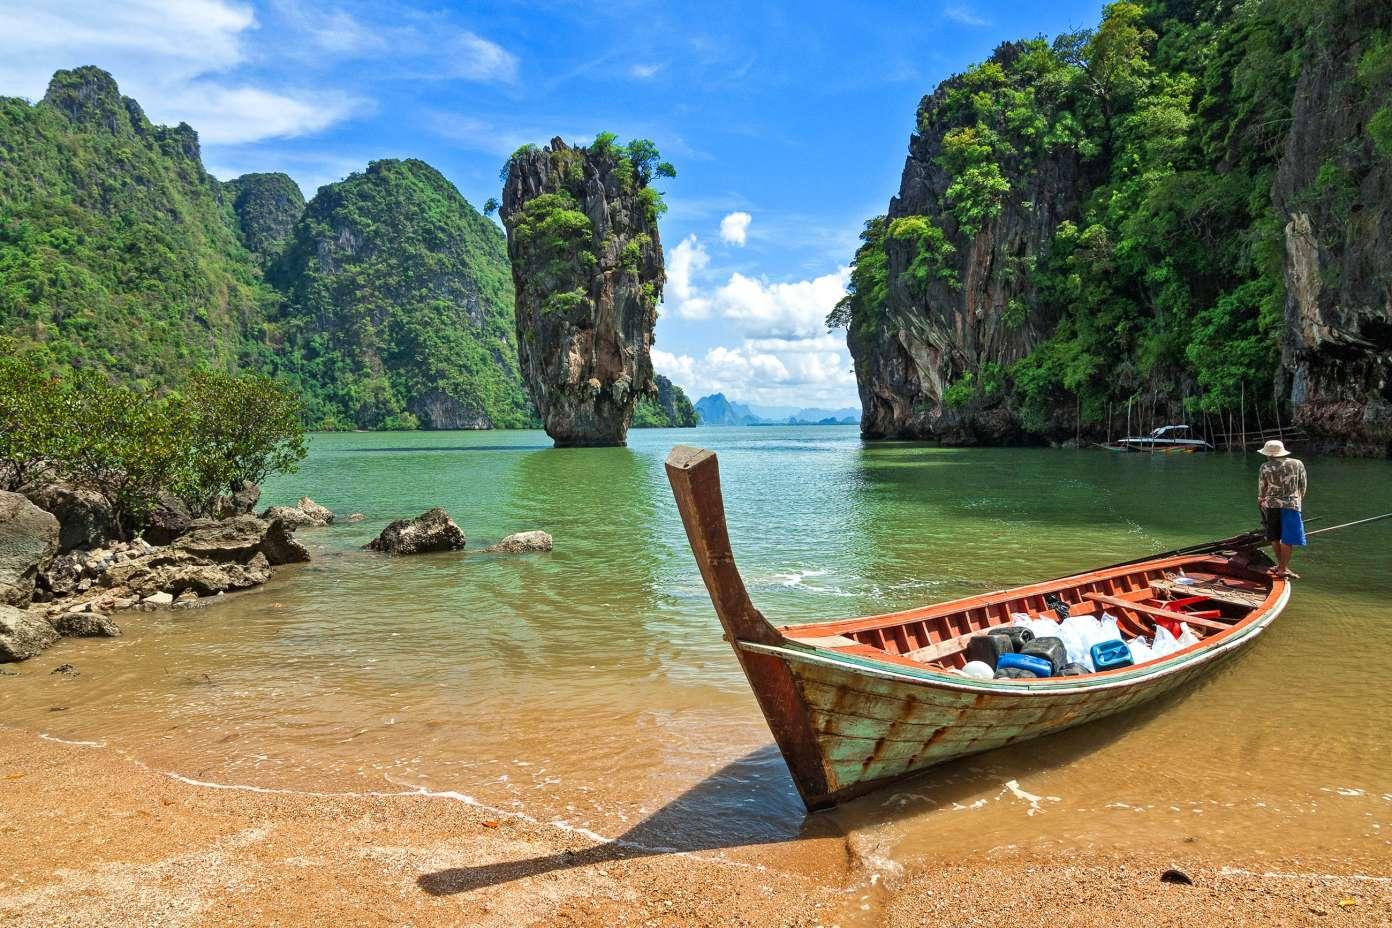 Ao Phang Nga National Park in Thailand